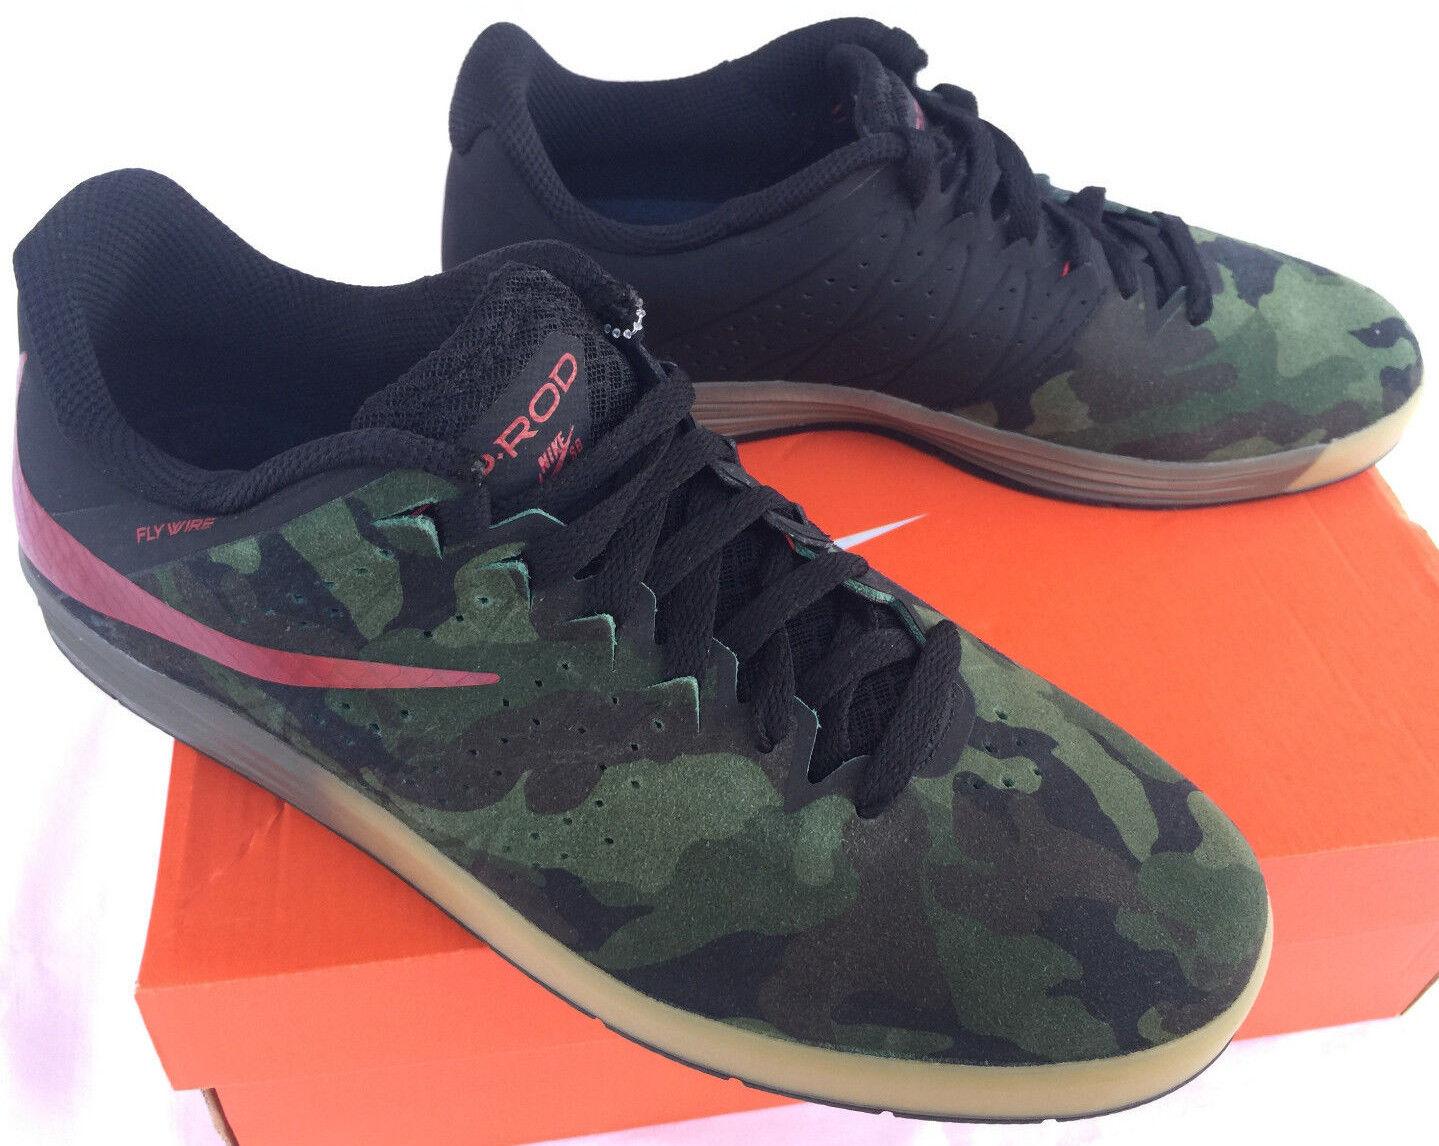 Nike SB Paul Rodriguez Citidel 555341-008 Camo Skateboarding Shoes Men's 9.5 new